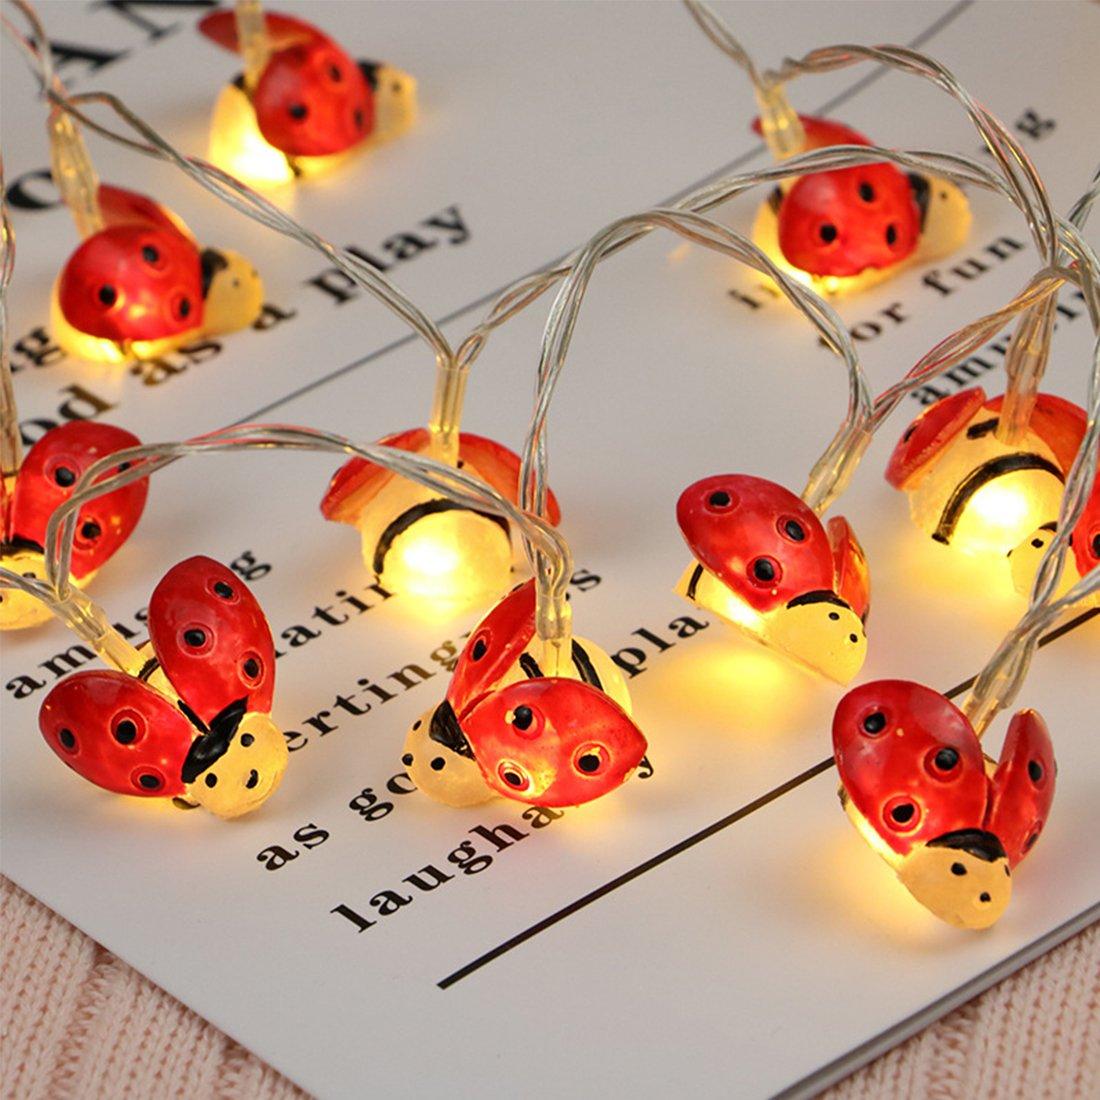 fantastic me Cute Red Ladybug Shape Fairy Lights - 6.6 ft 20 LED String Light, Decoration for Christmas Tree Festival Wedding Nursery Room Kids Bedroom-Battery Operated